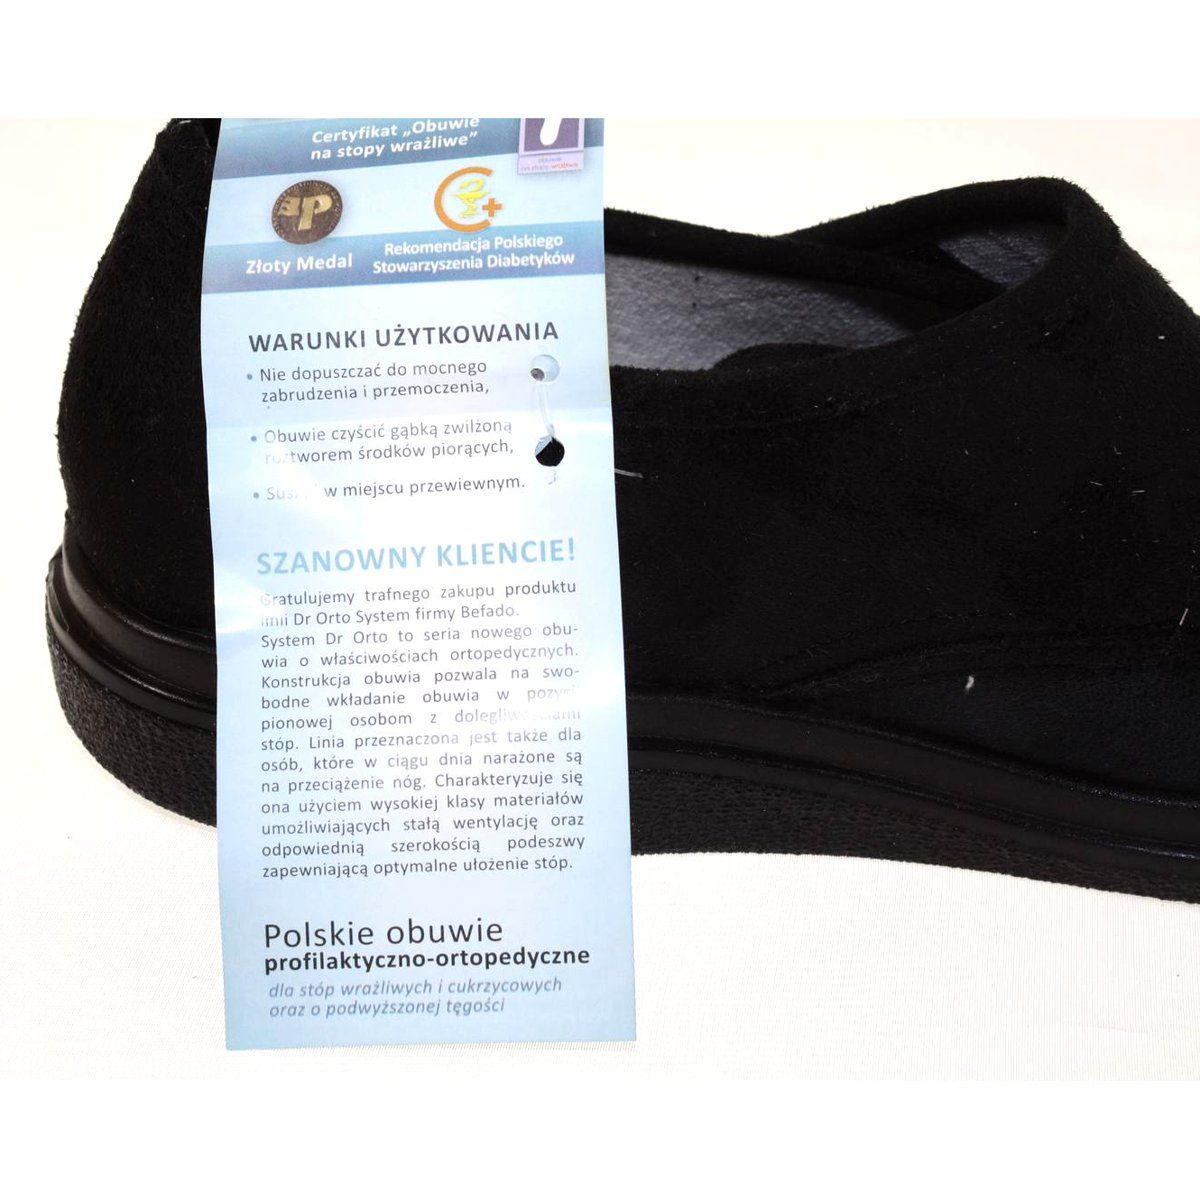 Buty Zdrowotne Wkladka Silver Befado 131m Czarne Shoes Sneakers Toms Original